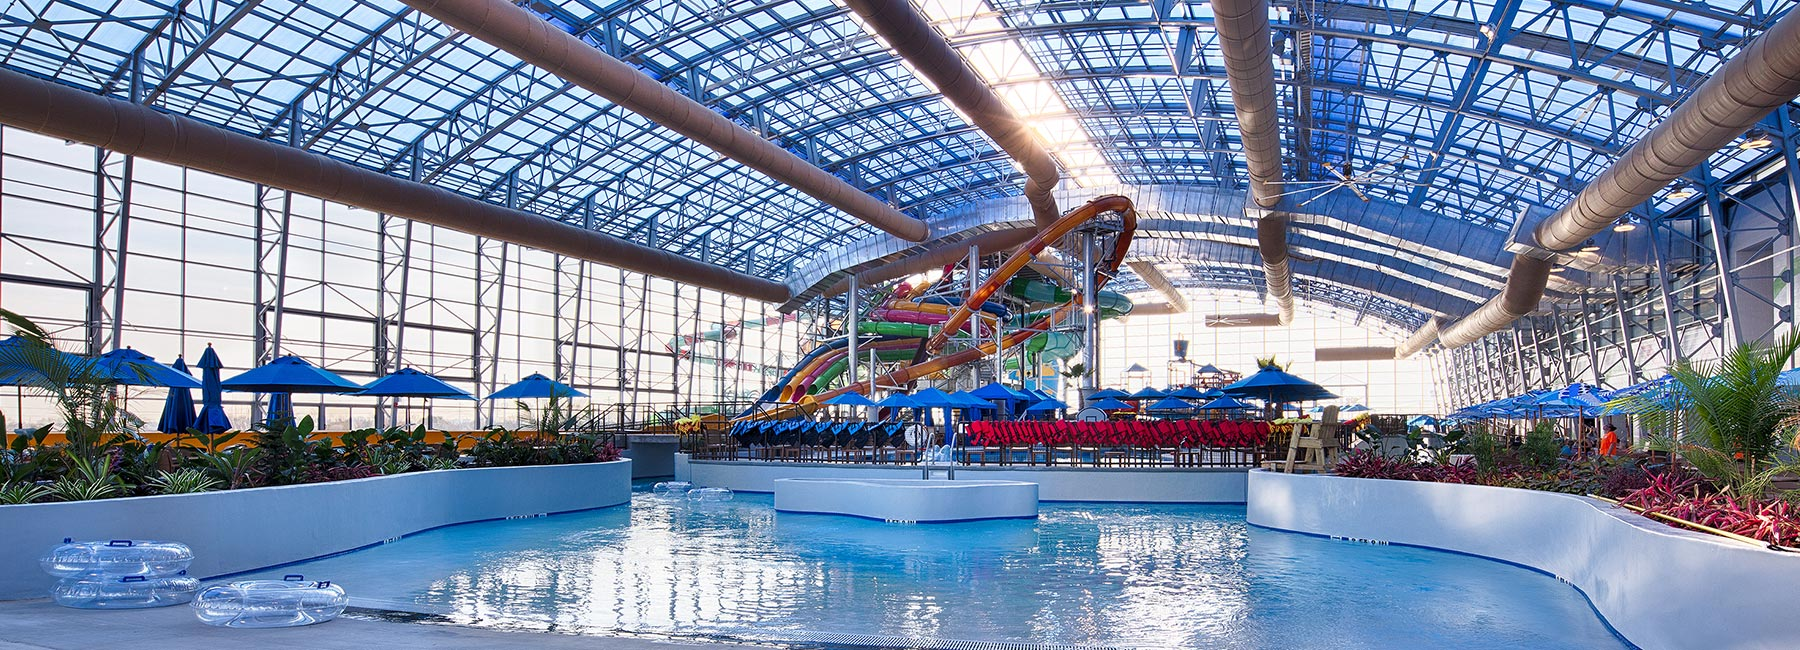 Waterpark & Aquatic Center Development